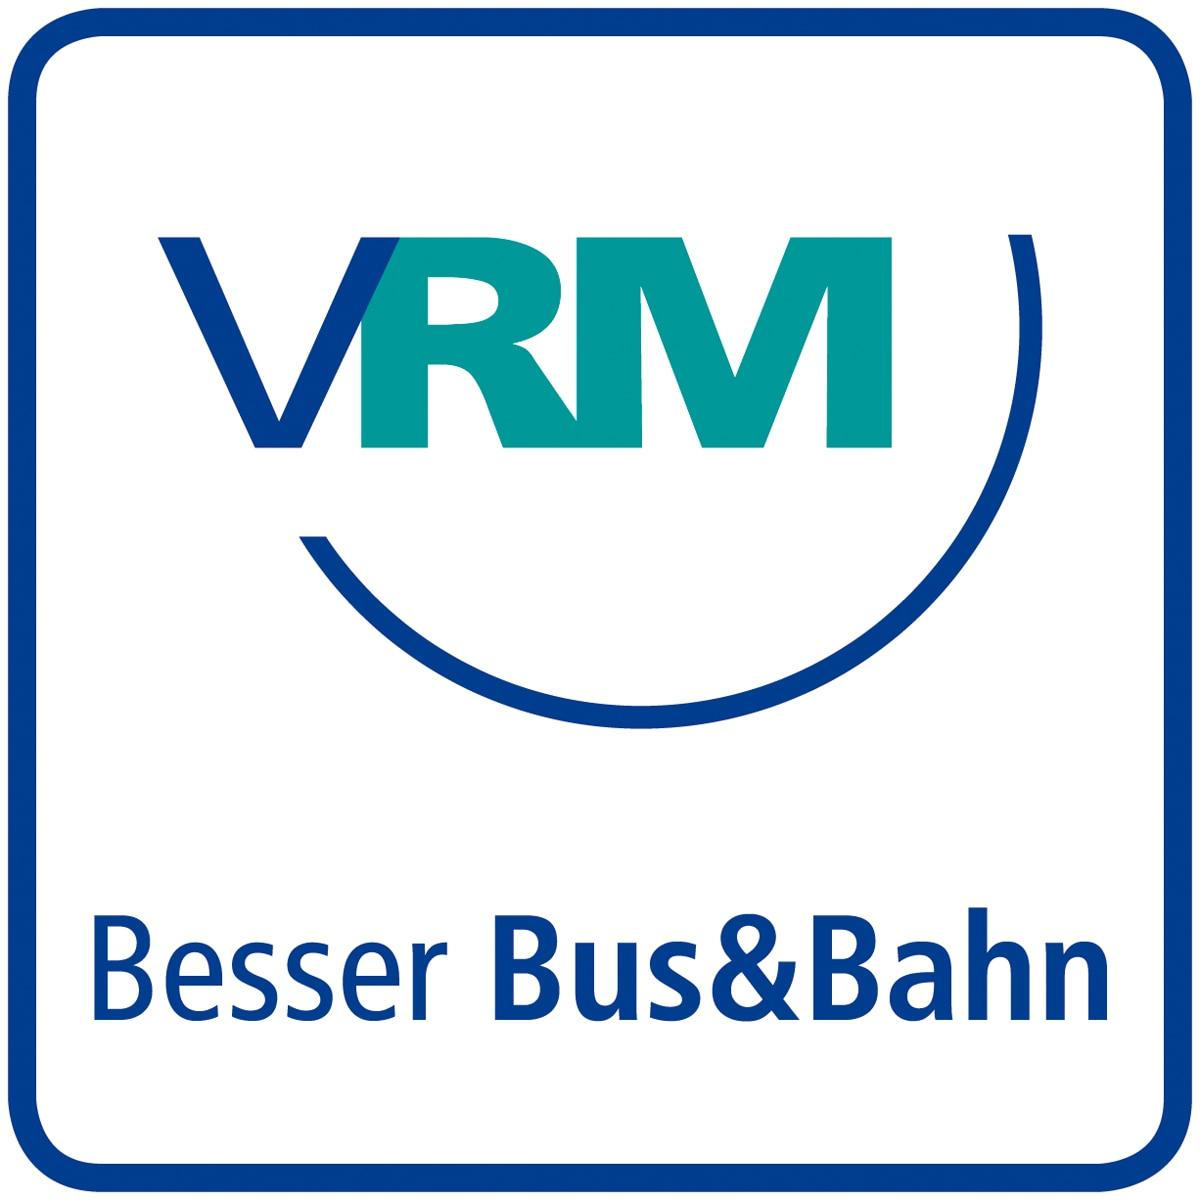 VRM Besser Bus&Bahn